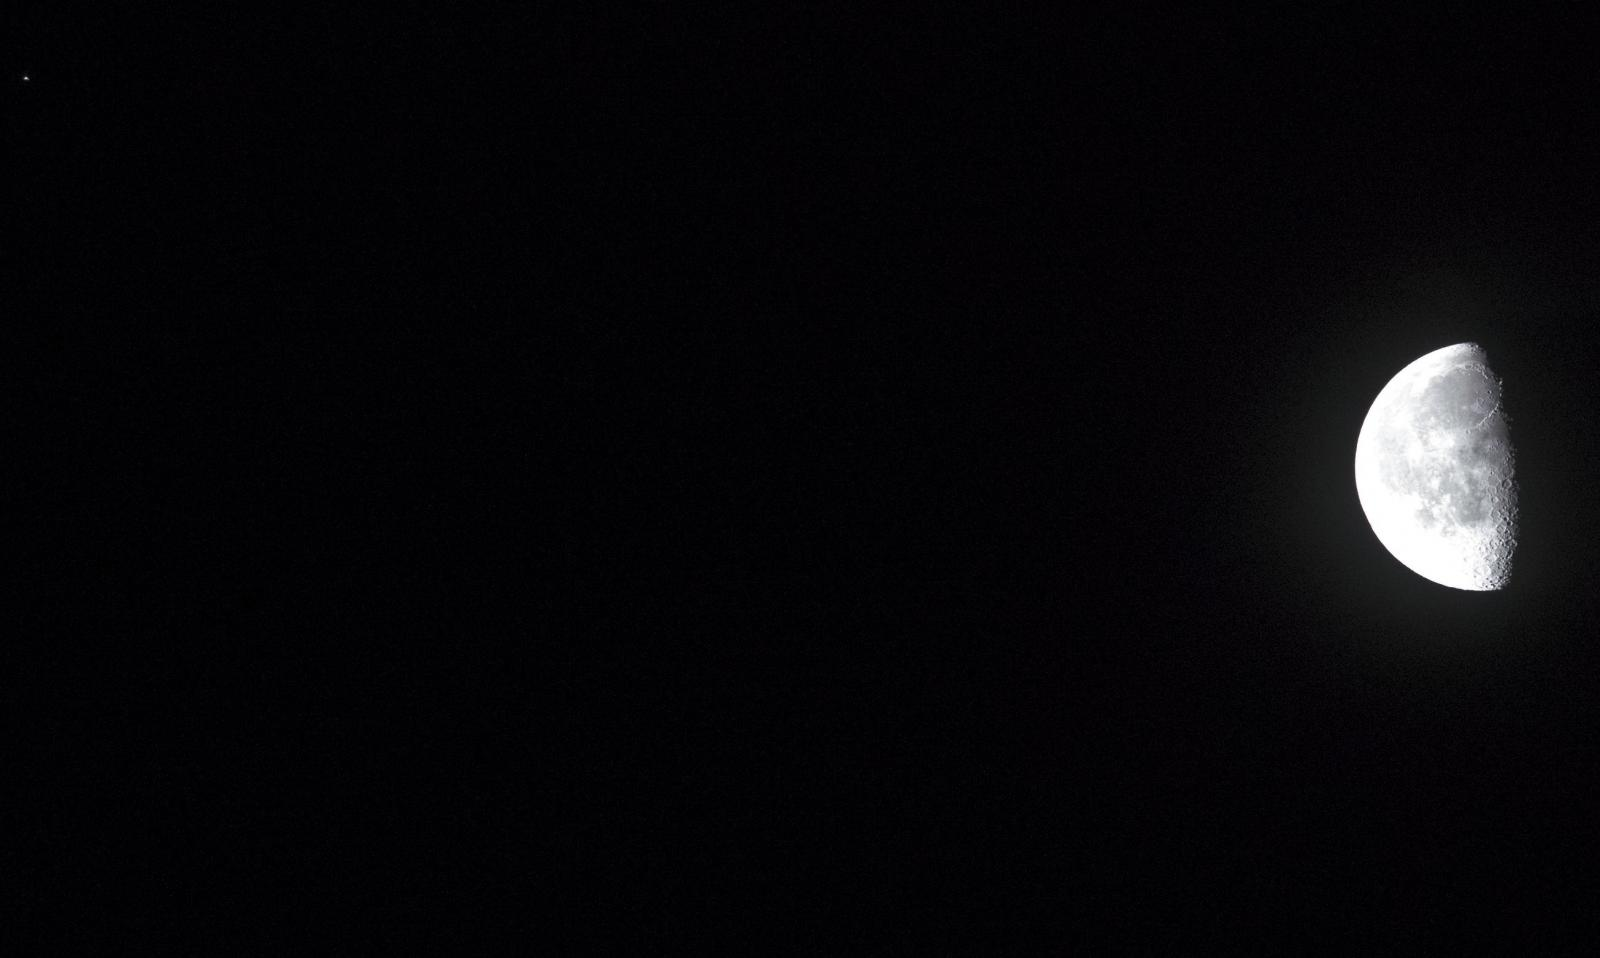 International Space Station Sightings - General Observing ...